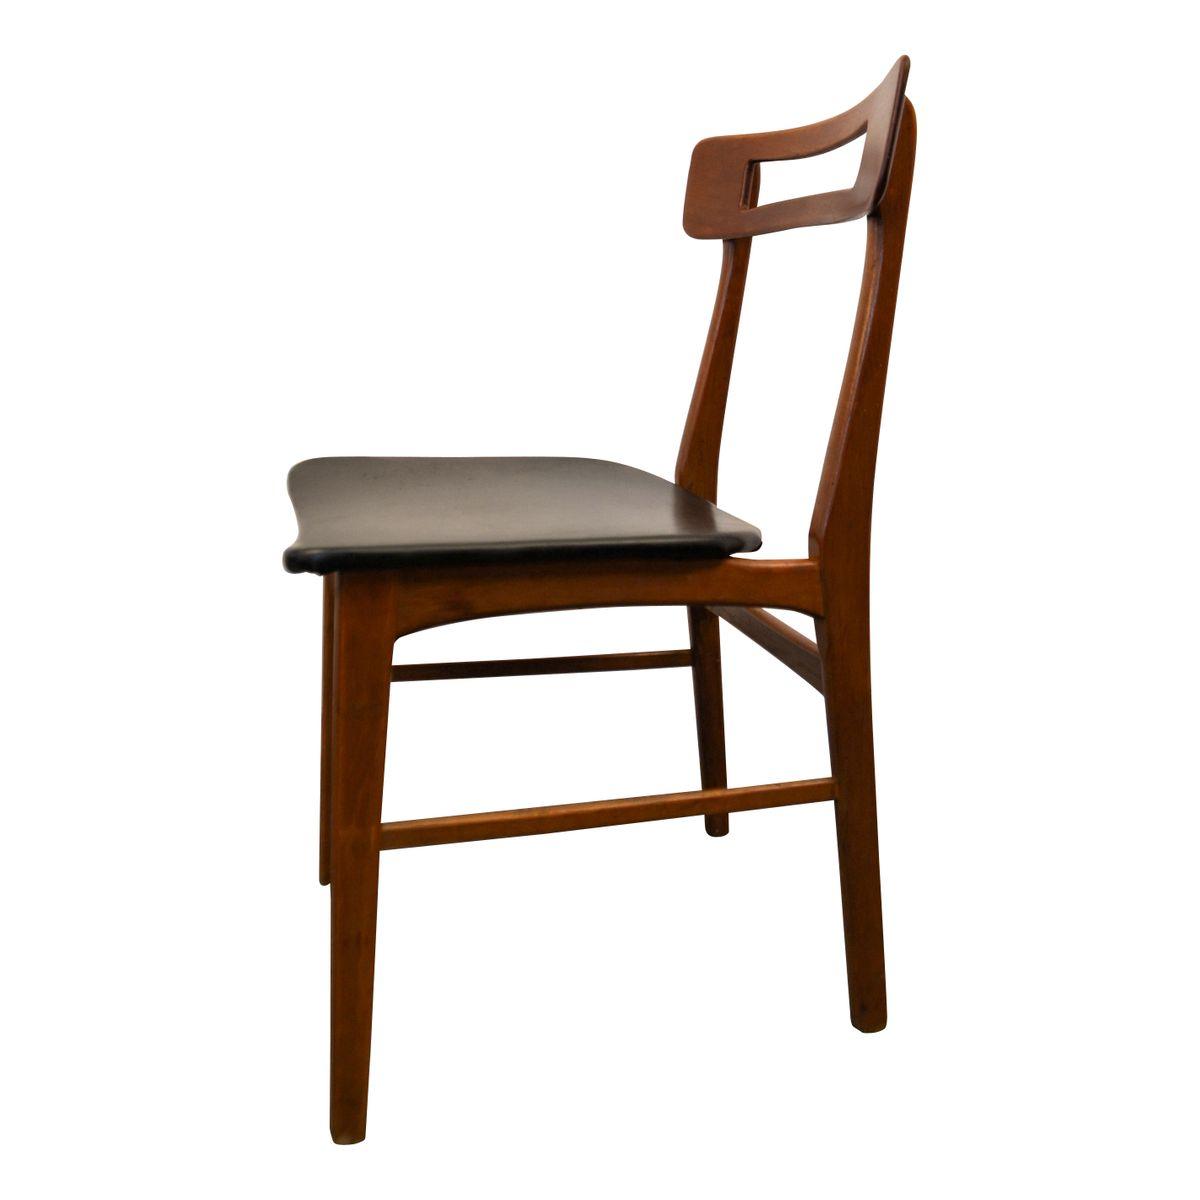 Danish Teak Dining Chairs 1950s Set of 6 for sale at Pamono : danish teak dining chairs 1950s set of 6 14 from www.pamono.co.uk size 1200 x 1200 jpeg 39kB